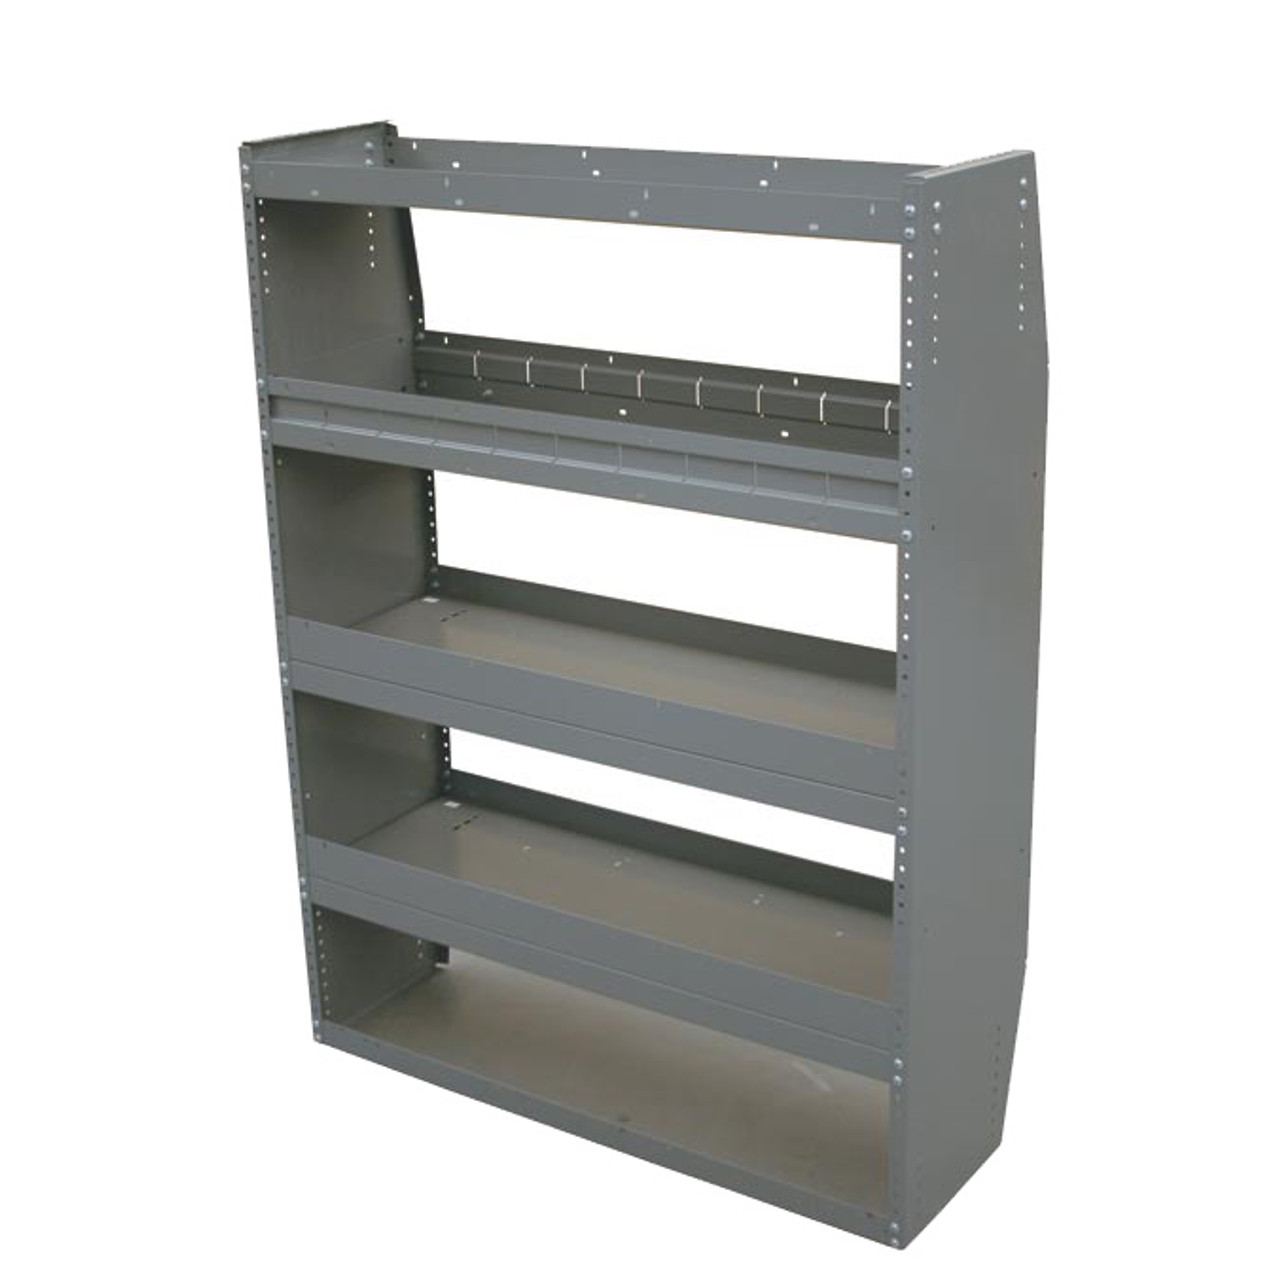 "36/""W x 36/""H x 12/""D Adrian Steel MD523 Open End Adjustable Shelf Unit"